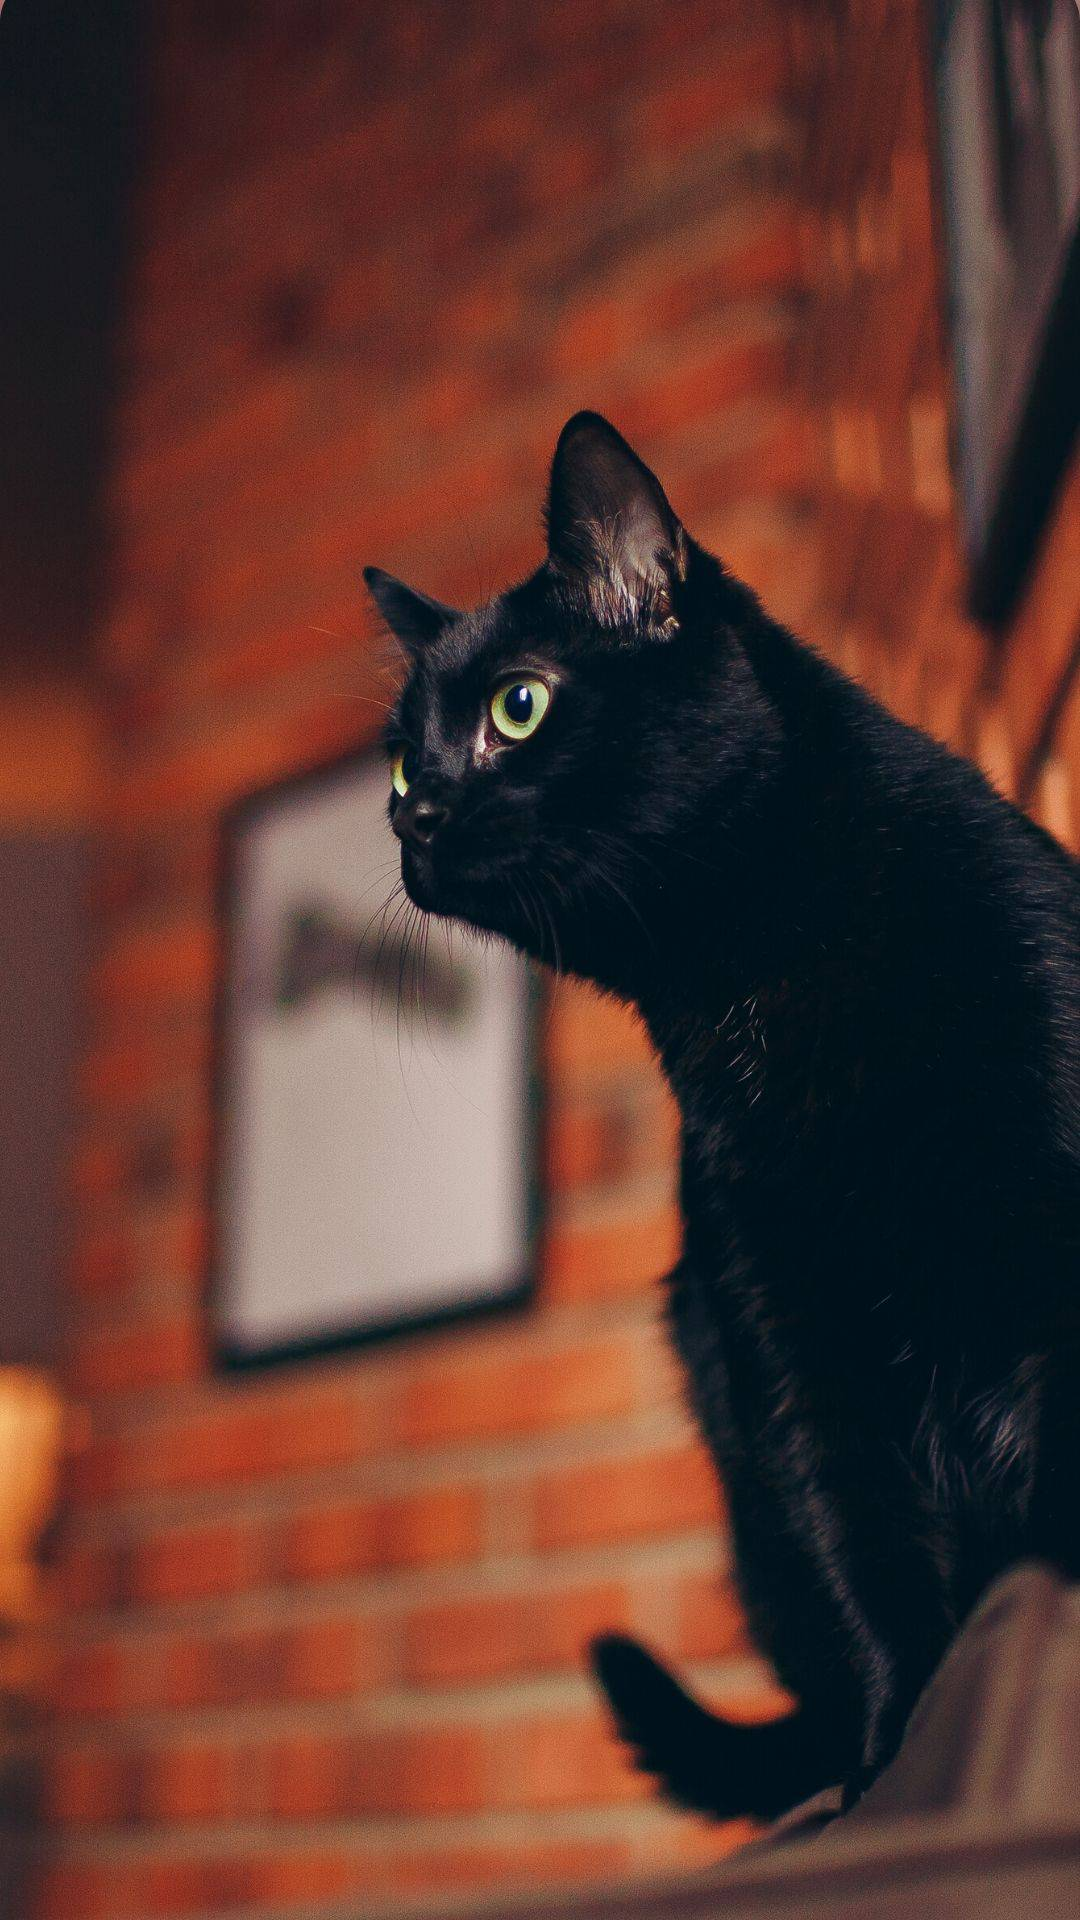 black cat in front of bricks